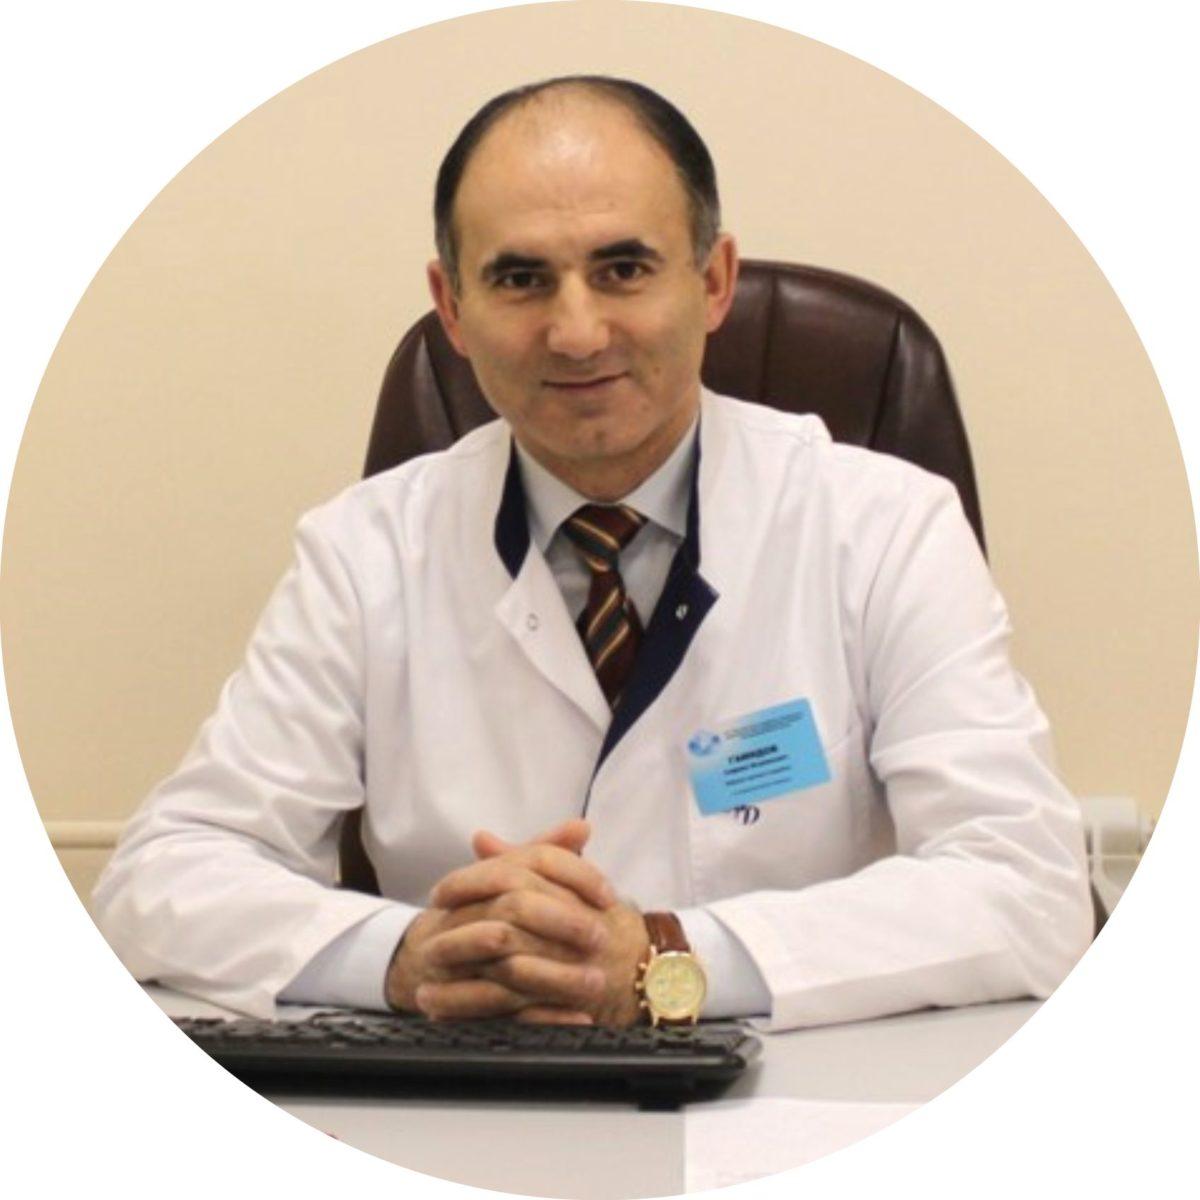 «Олимп Здоровья» приглашает на консультацию уролога-андролога Сафара Гамидова